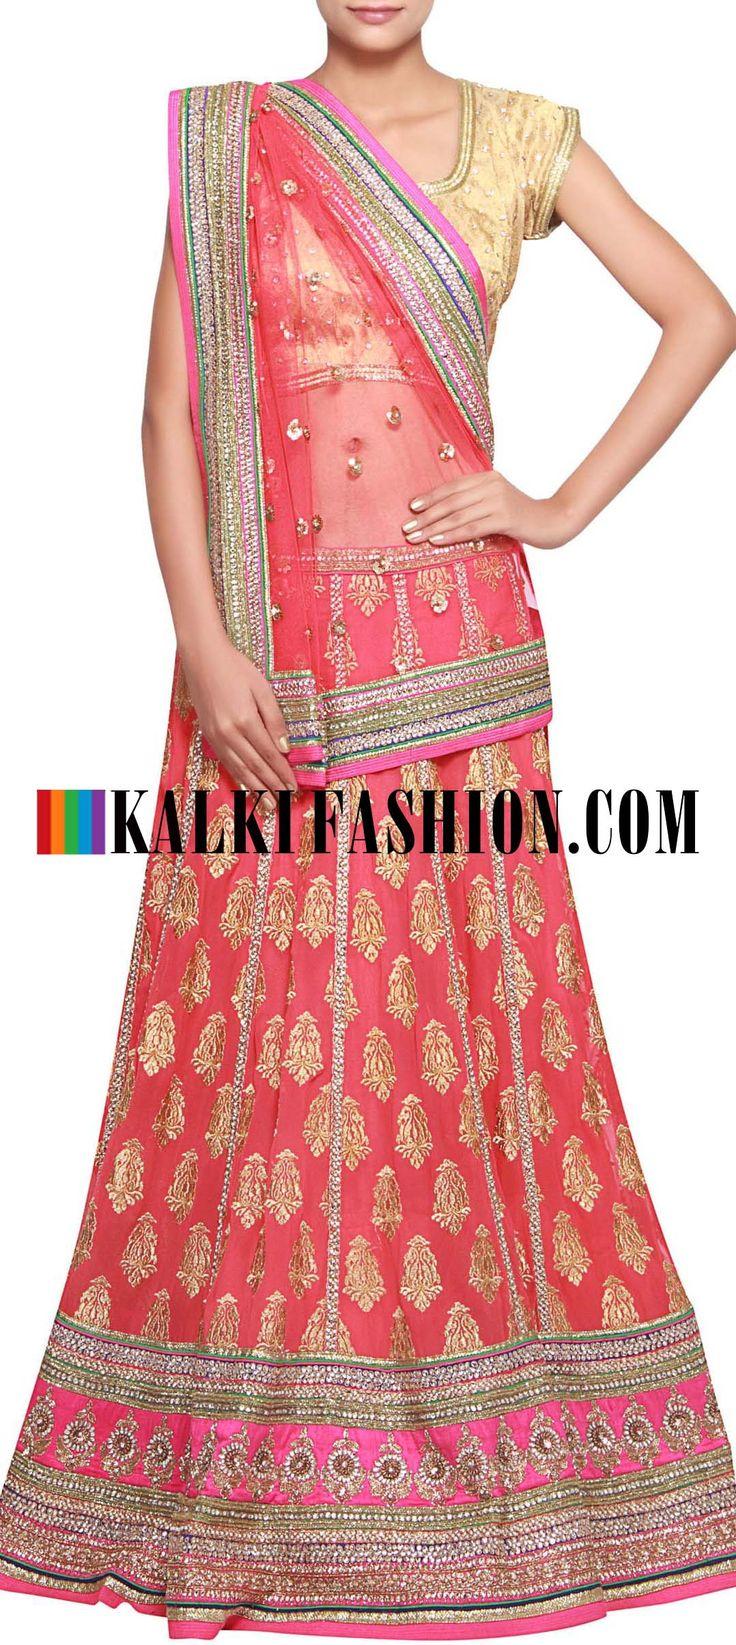 Get this beautiful lehenga here: http://www.kalkifashion.com/peach-lehenga-embellished-in-zari-embroidered-butti-only-on-kalki.html Free shipping worldwide.